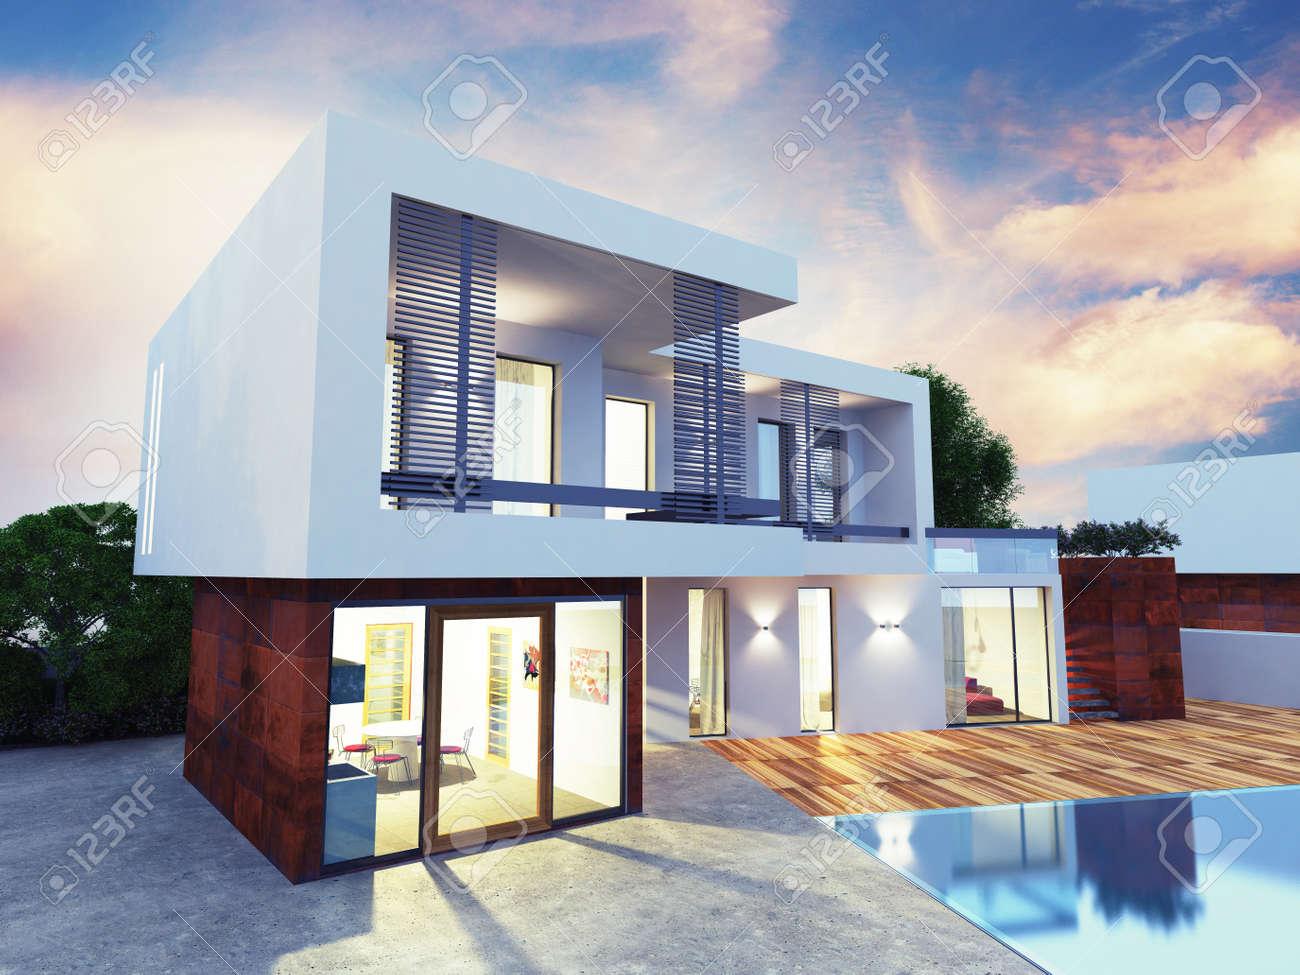 Progetti Esterni Case : Disegni di case moderne. beautiful casa in legno urb with disegni di